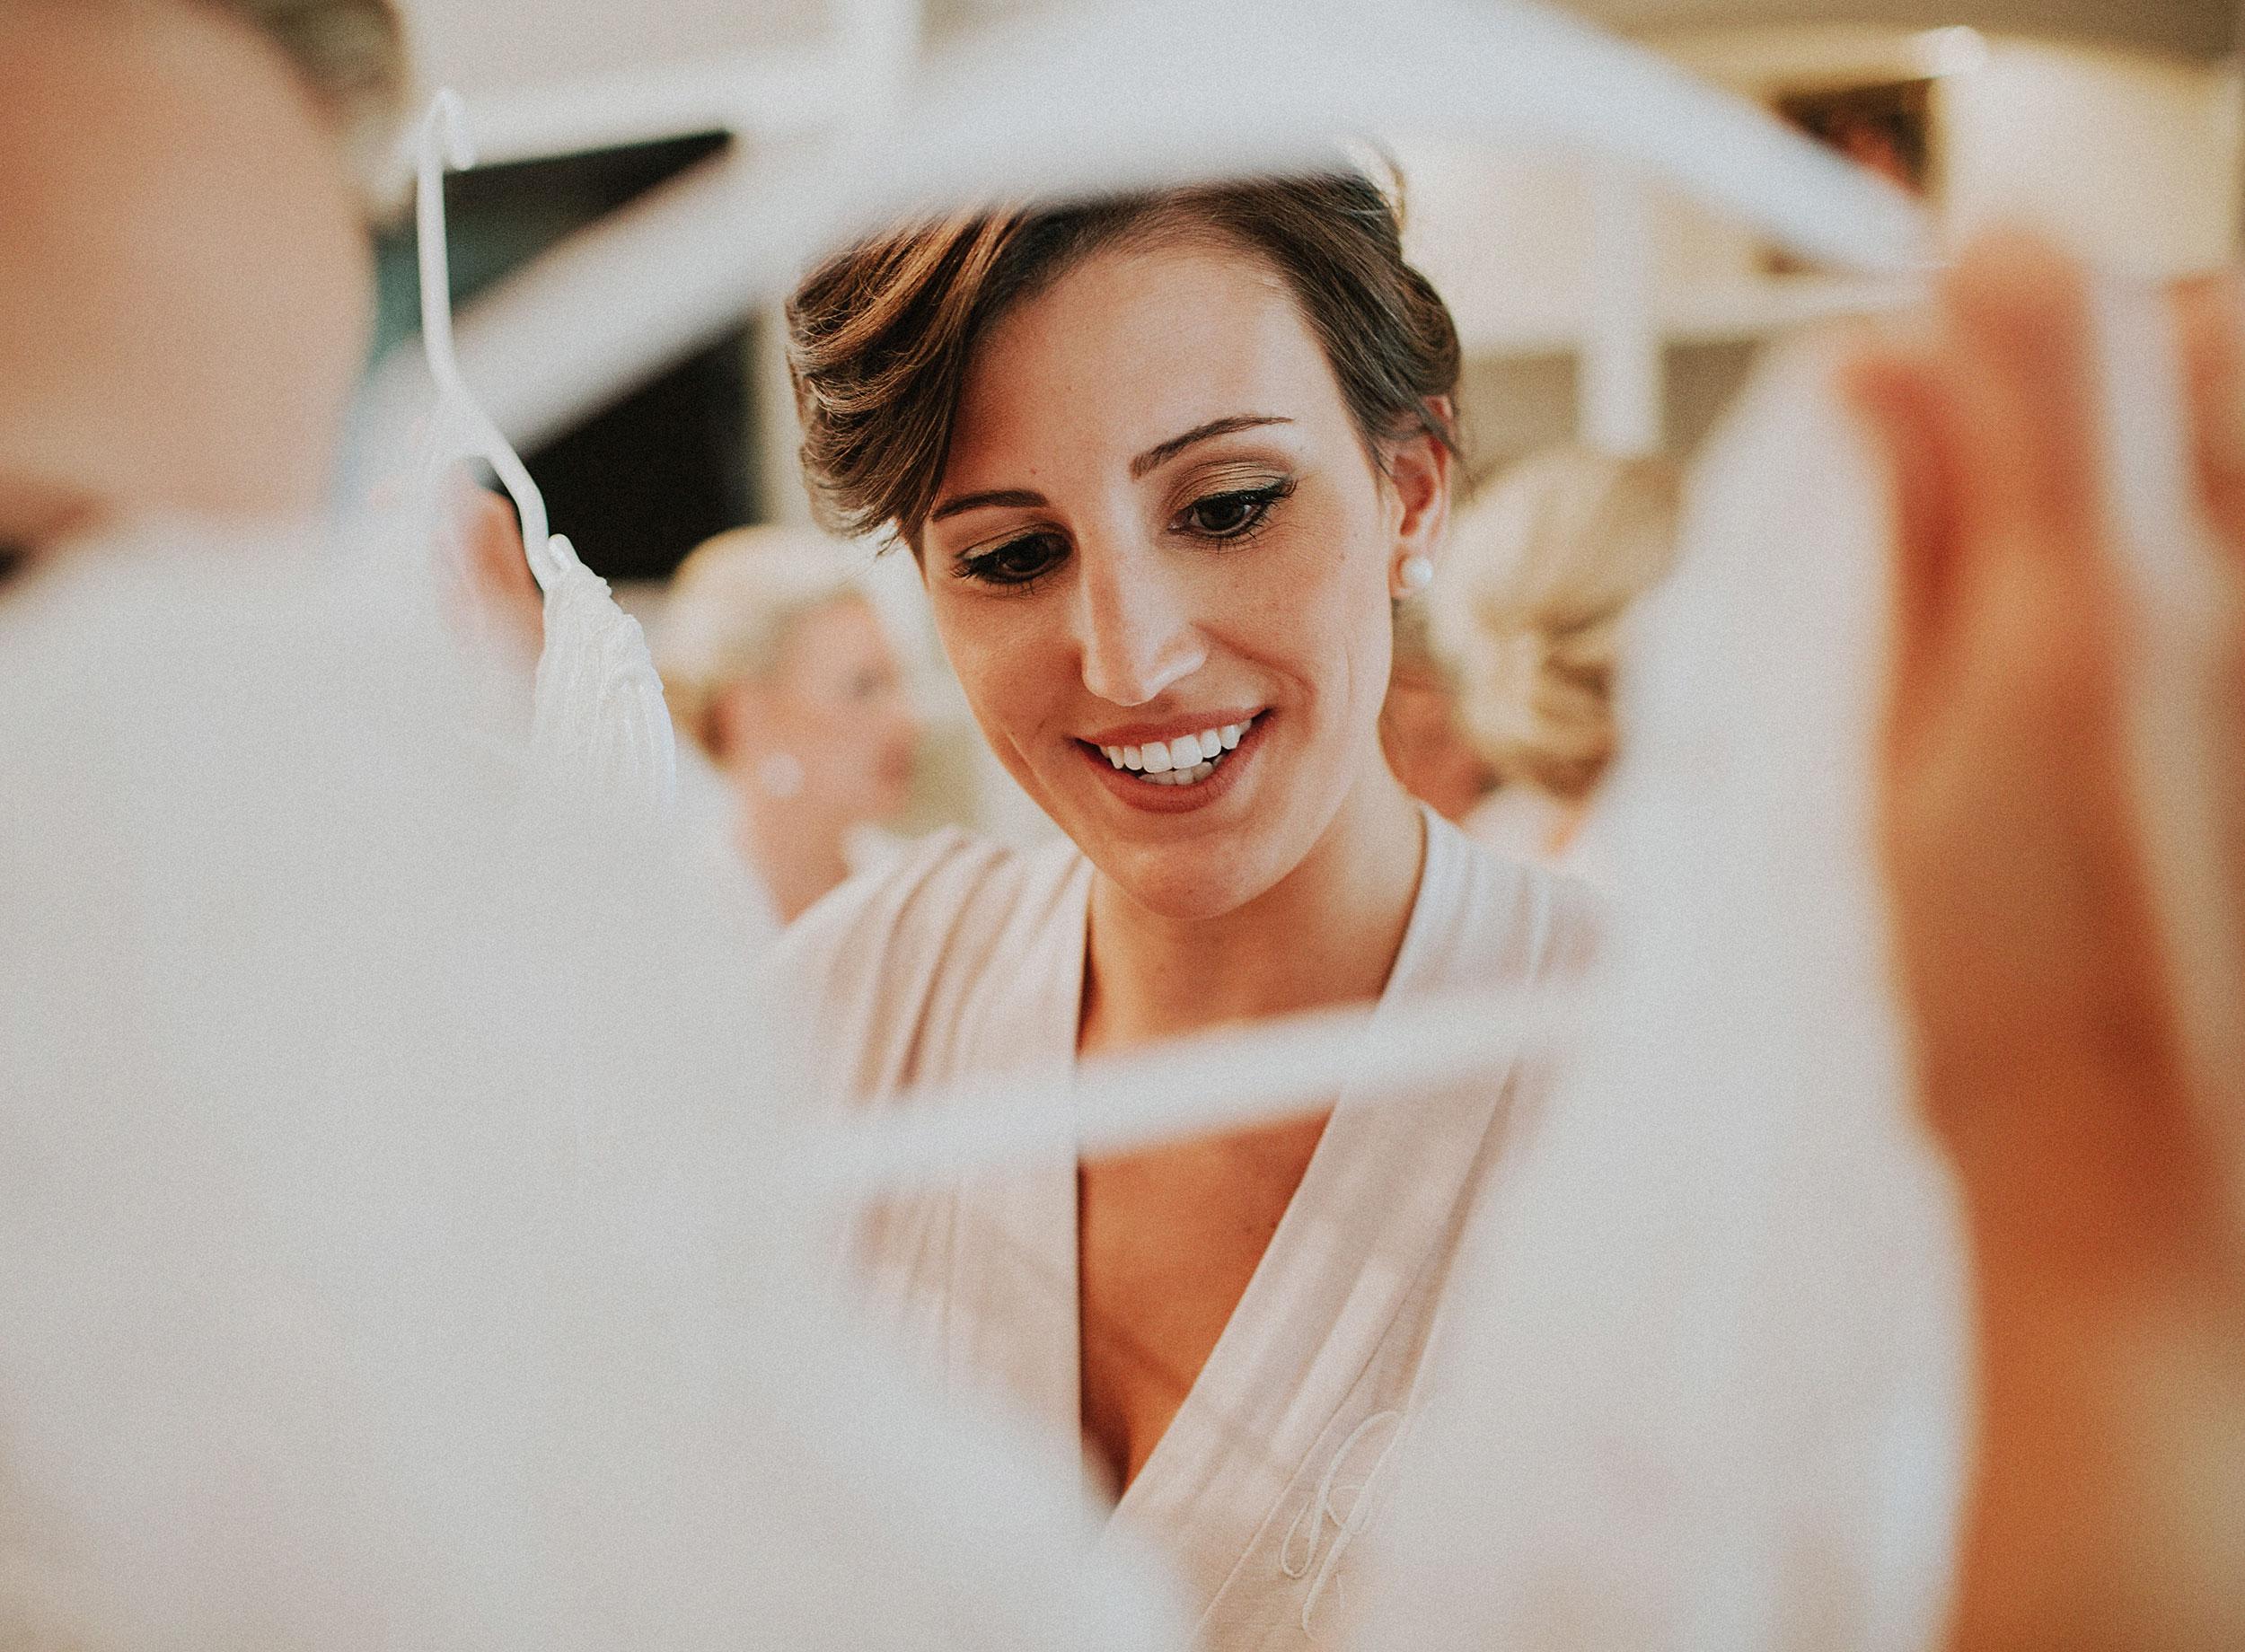 olmsted-wedding-louisville-kentucky-013.JPG